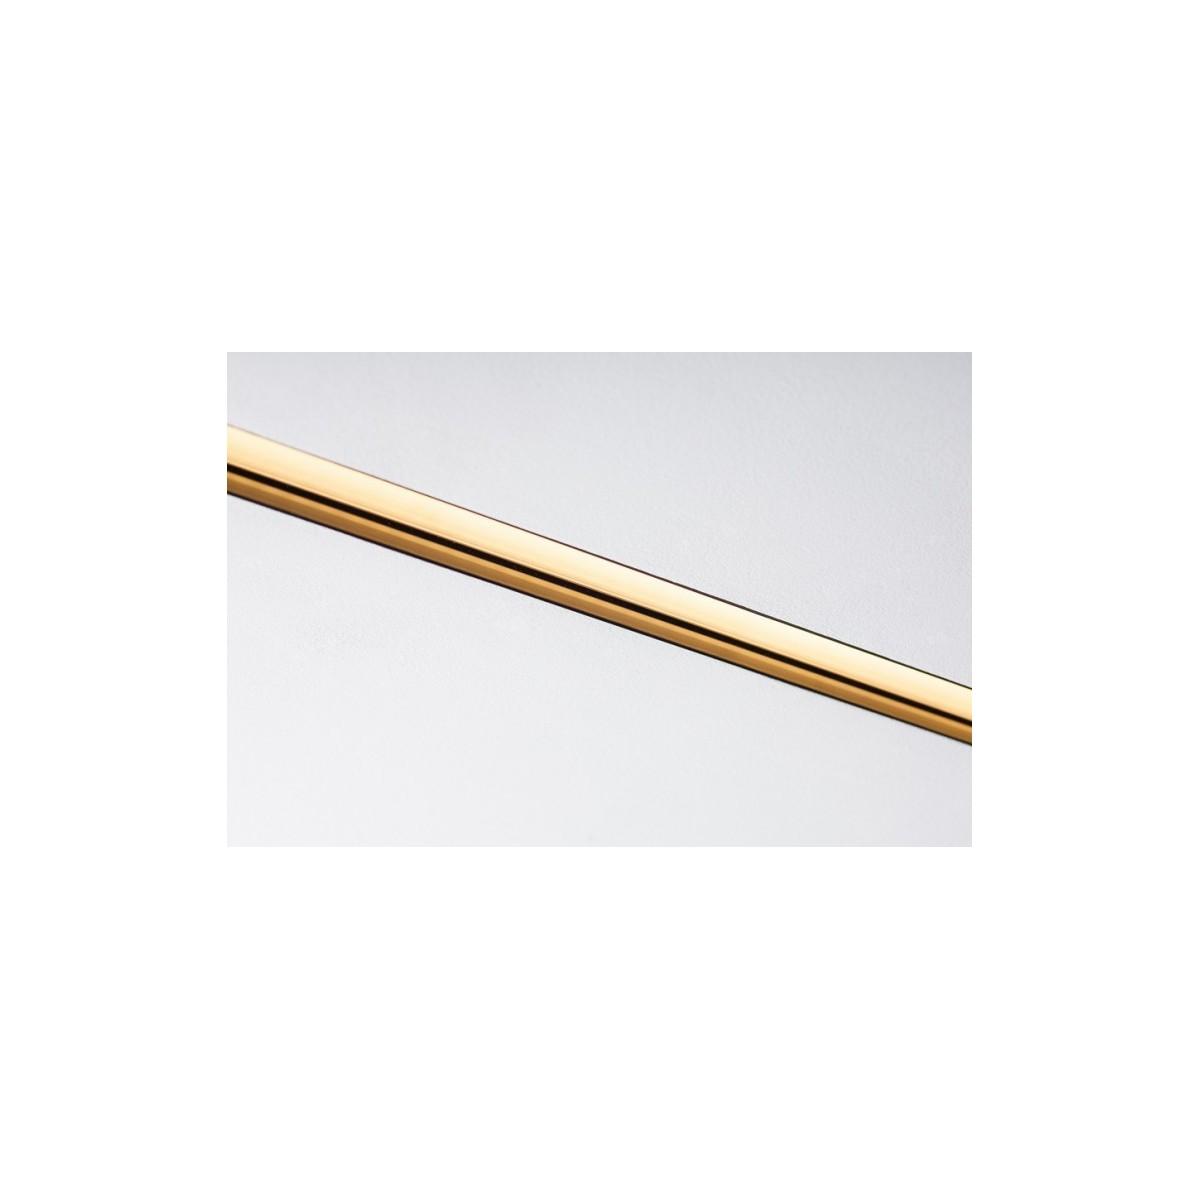 Labra RAY WP.854mm 35W High Power 6-0637 Wpust